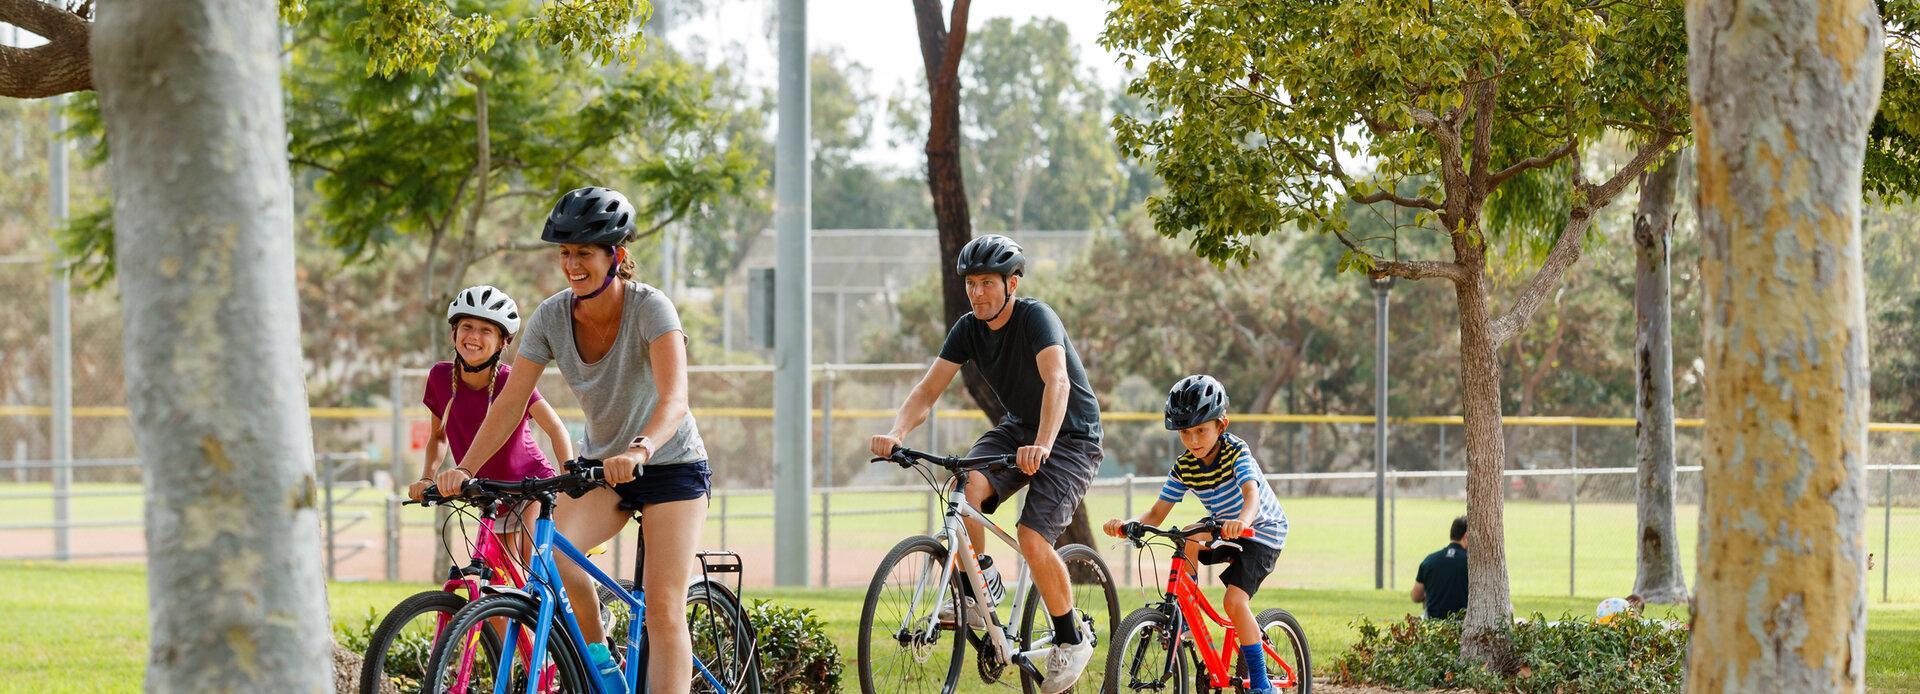 Bright Bike Hire | Road, Mountain and E-bike Hire | CyclePath